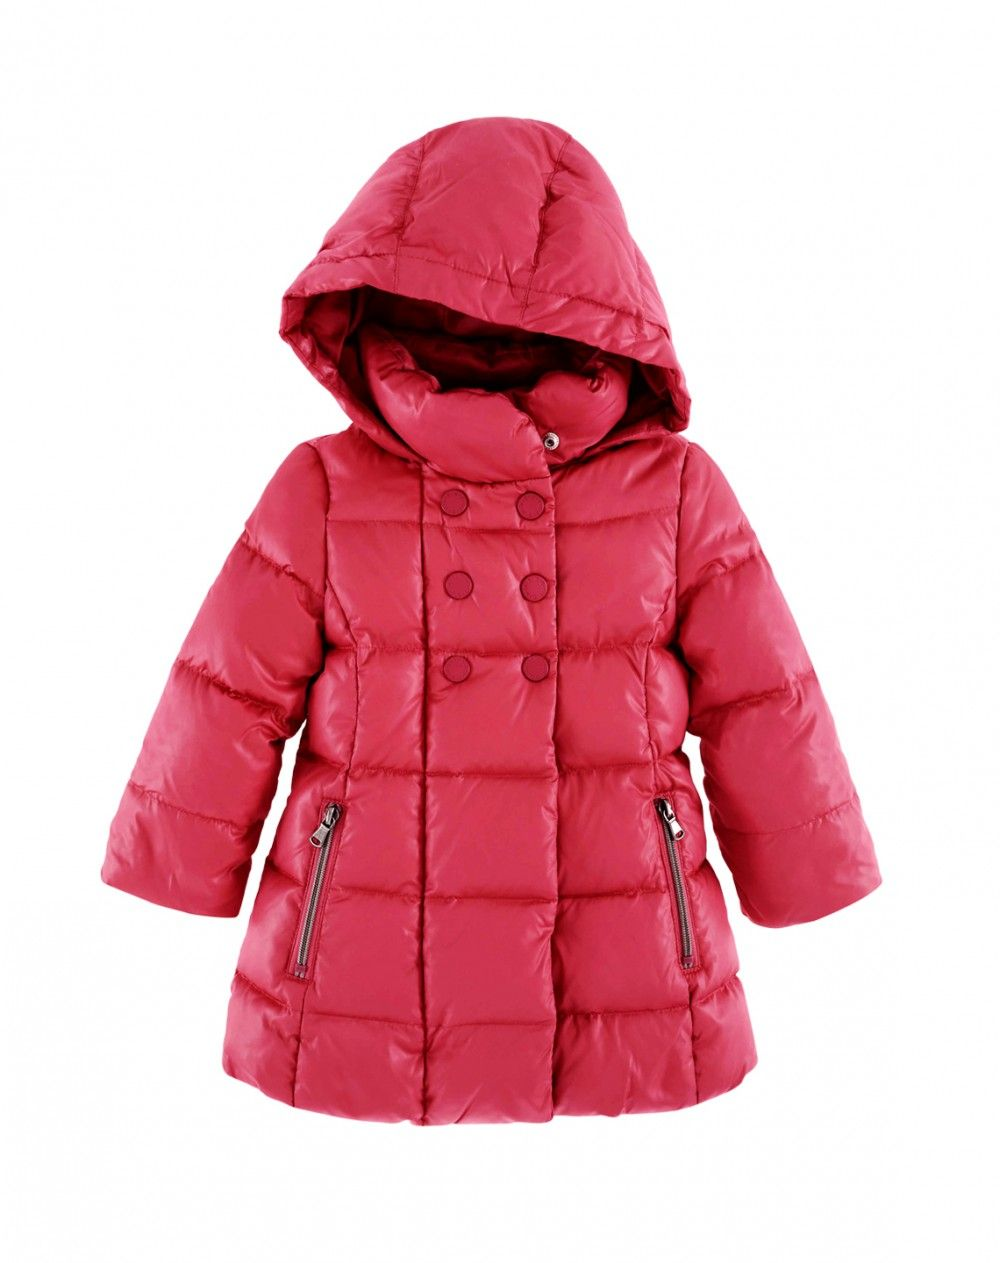 Long Sleeved Down Filled Jacket Down Jackets Coats Jackets Autumn Winter Girl Age Kids Kids Outerwear Baby Girl Jackets Girls Jacket [ 1263 x 1000 Pixel ]